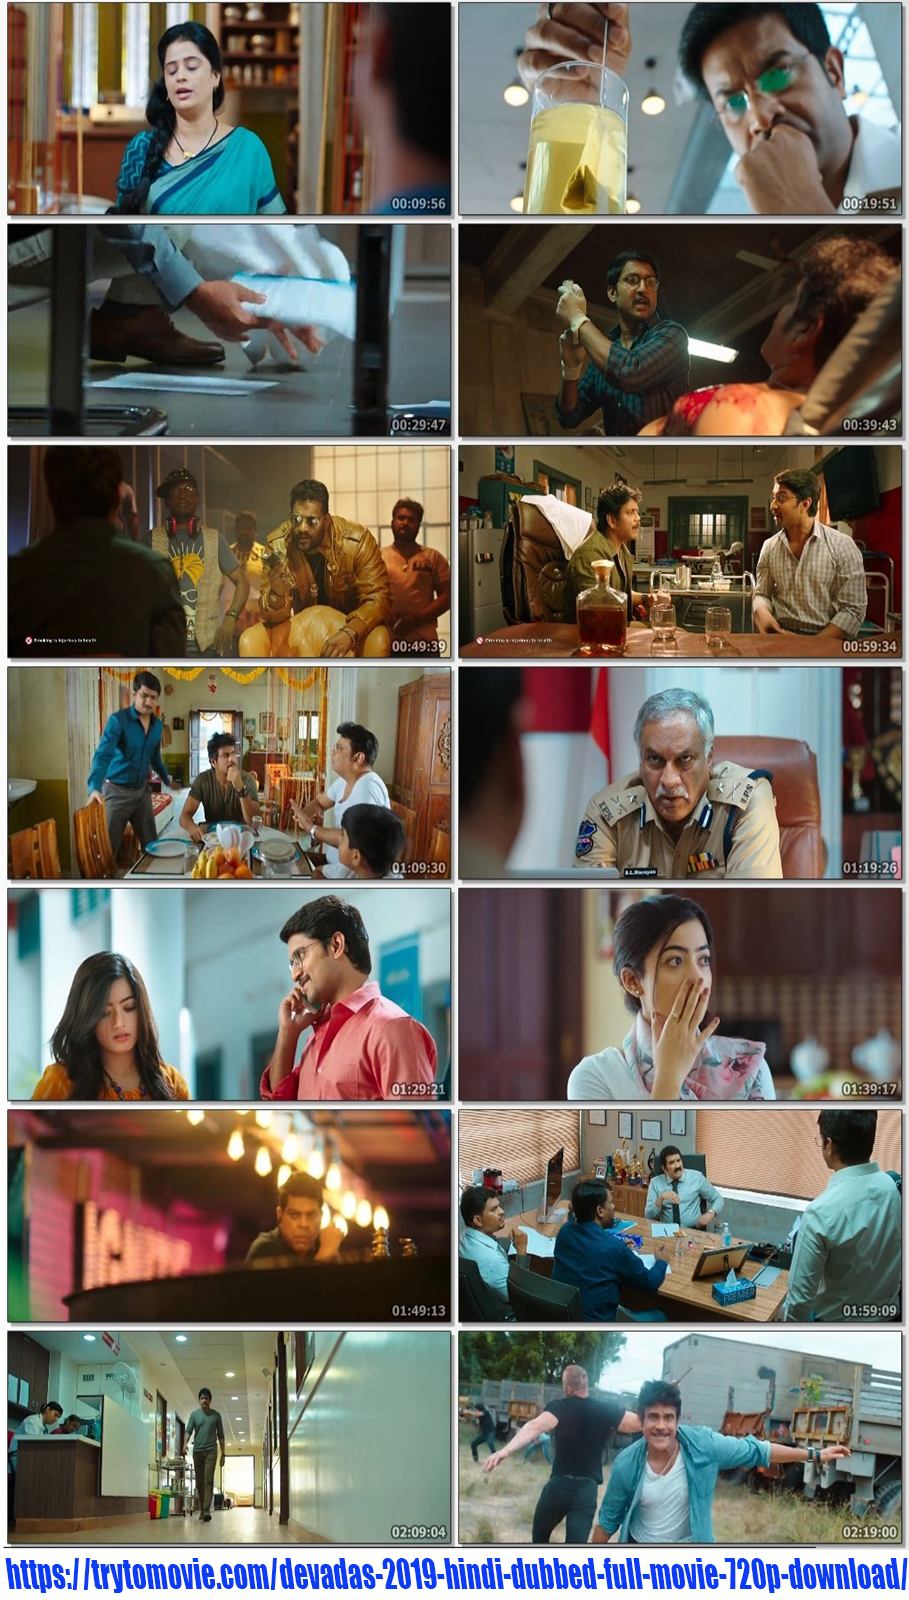 Devadas 2019 Hindi Dubbed Full Movie 720p Download